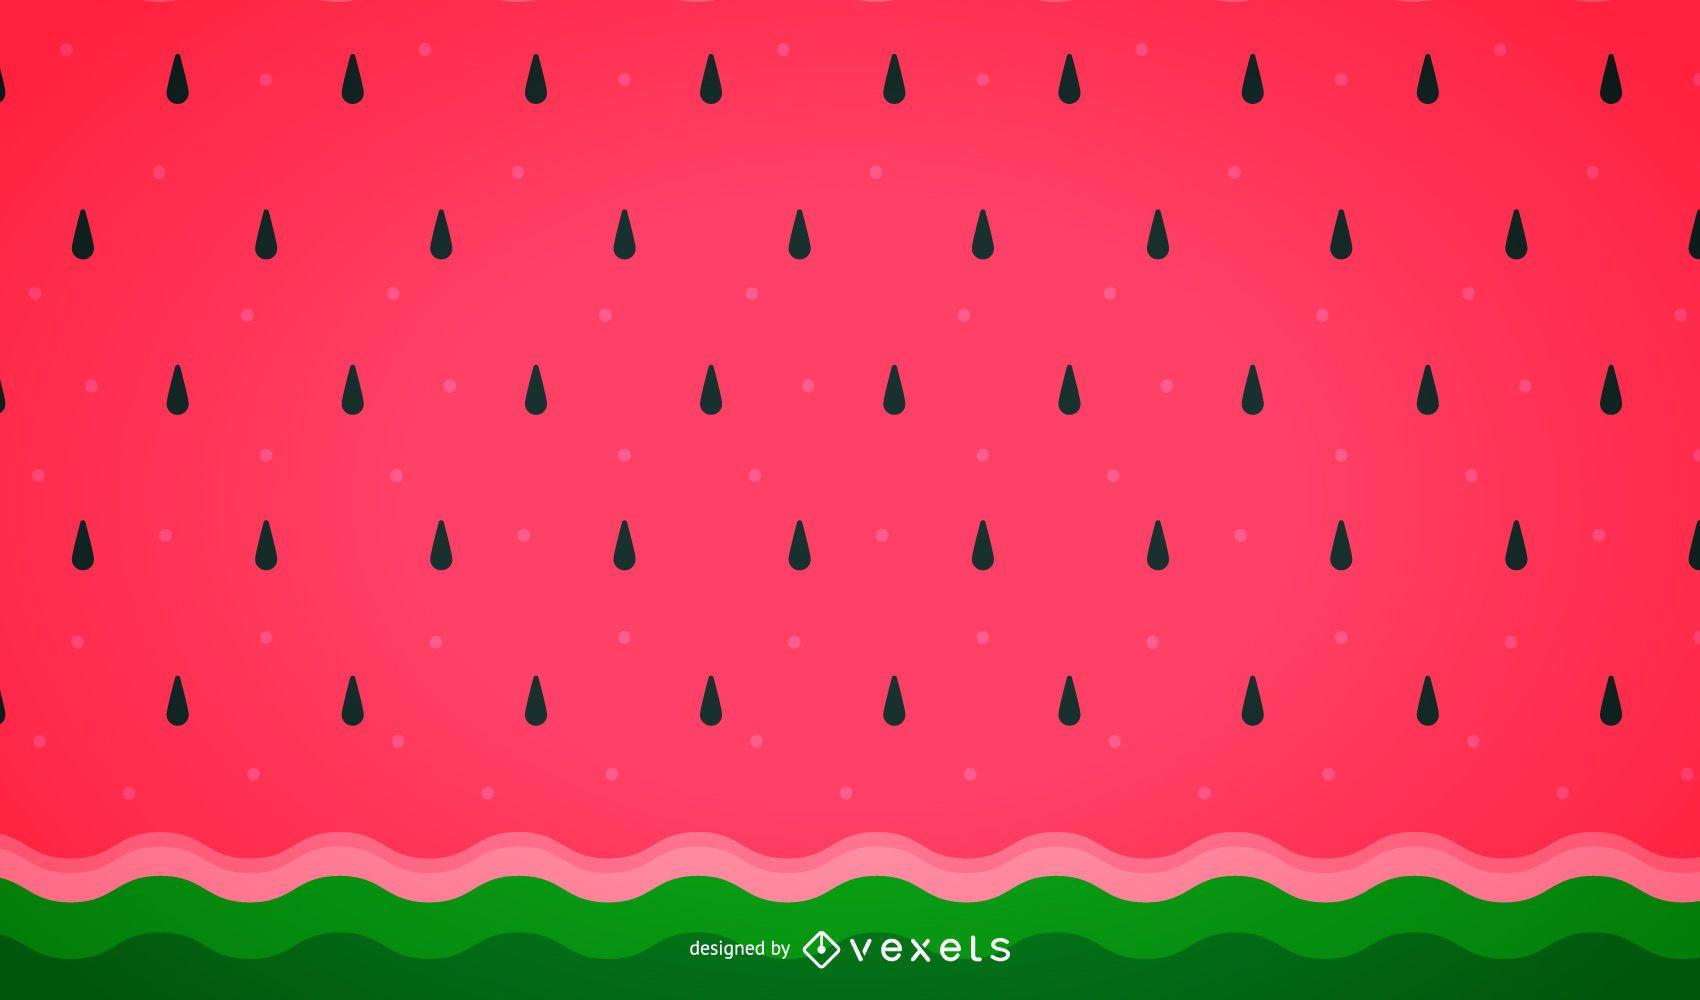 Minimalist watermelon background pattern